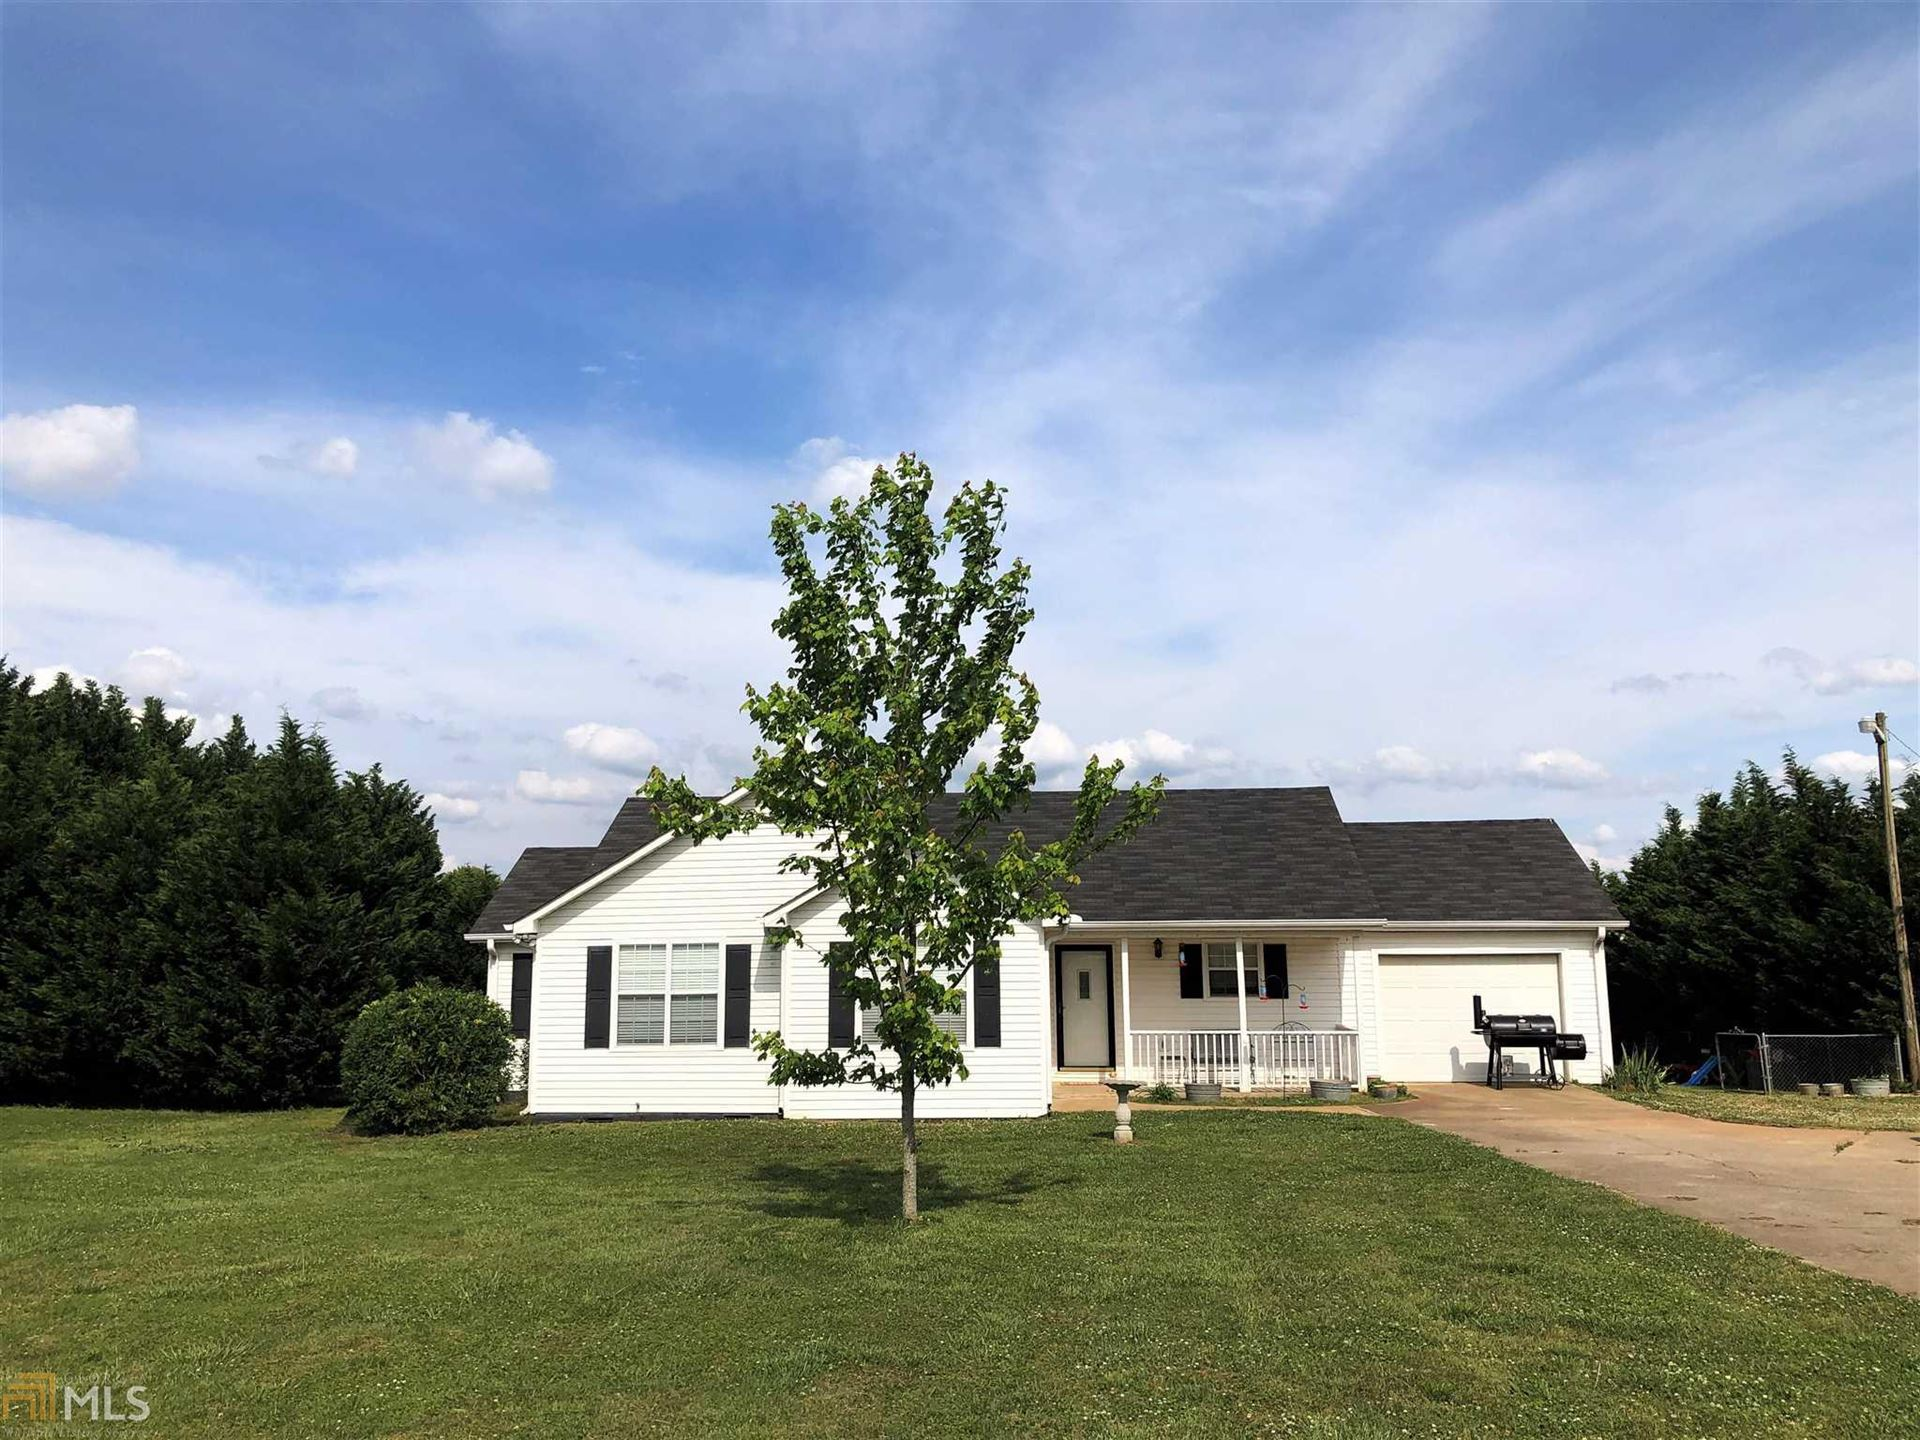 59 Lakeside Rd, Williamson, GA 30292 - #: 8977905